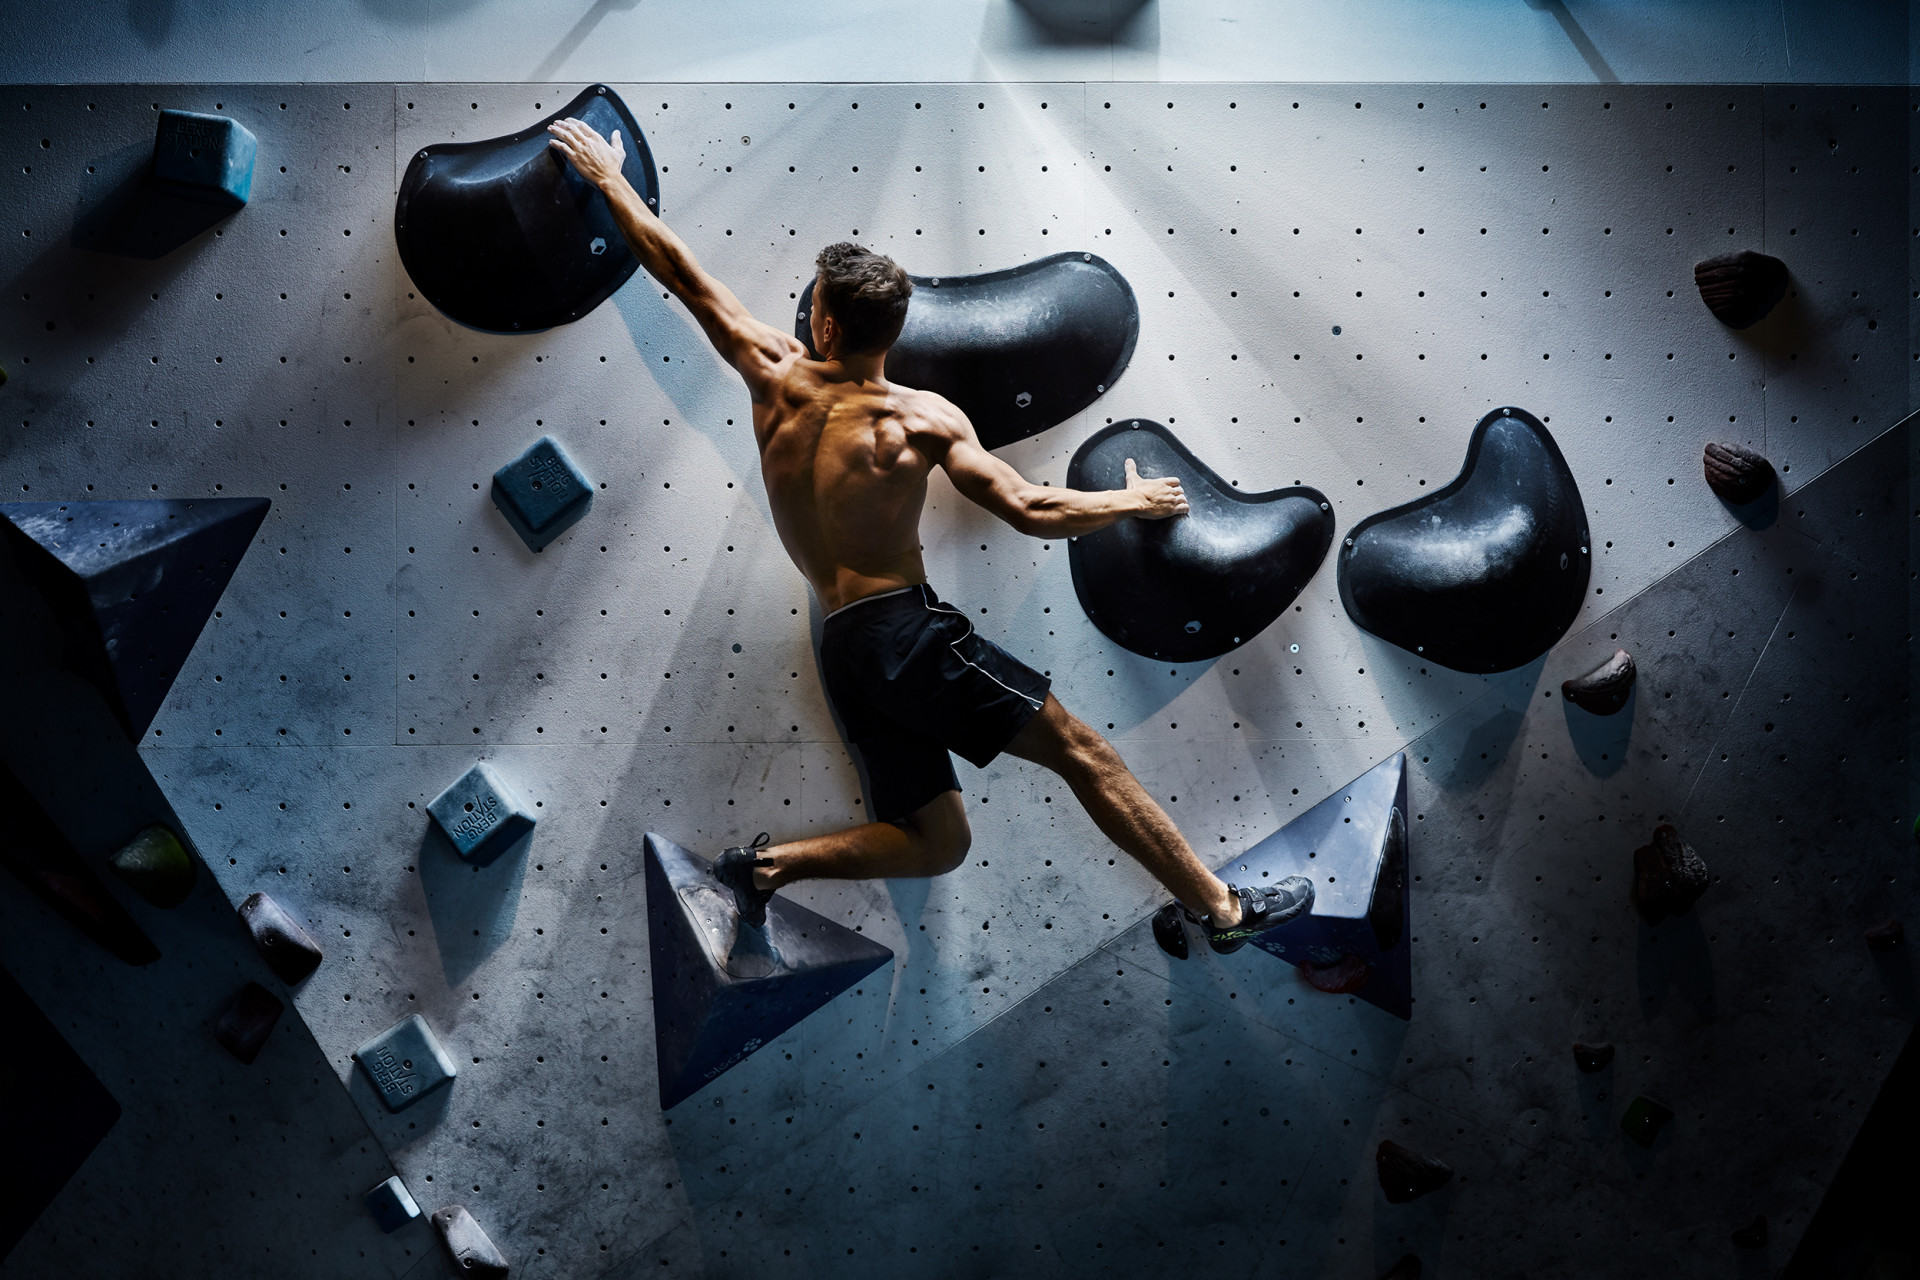 Climbing Bilder Yannick Flohe - Bergstation